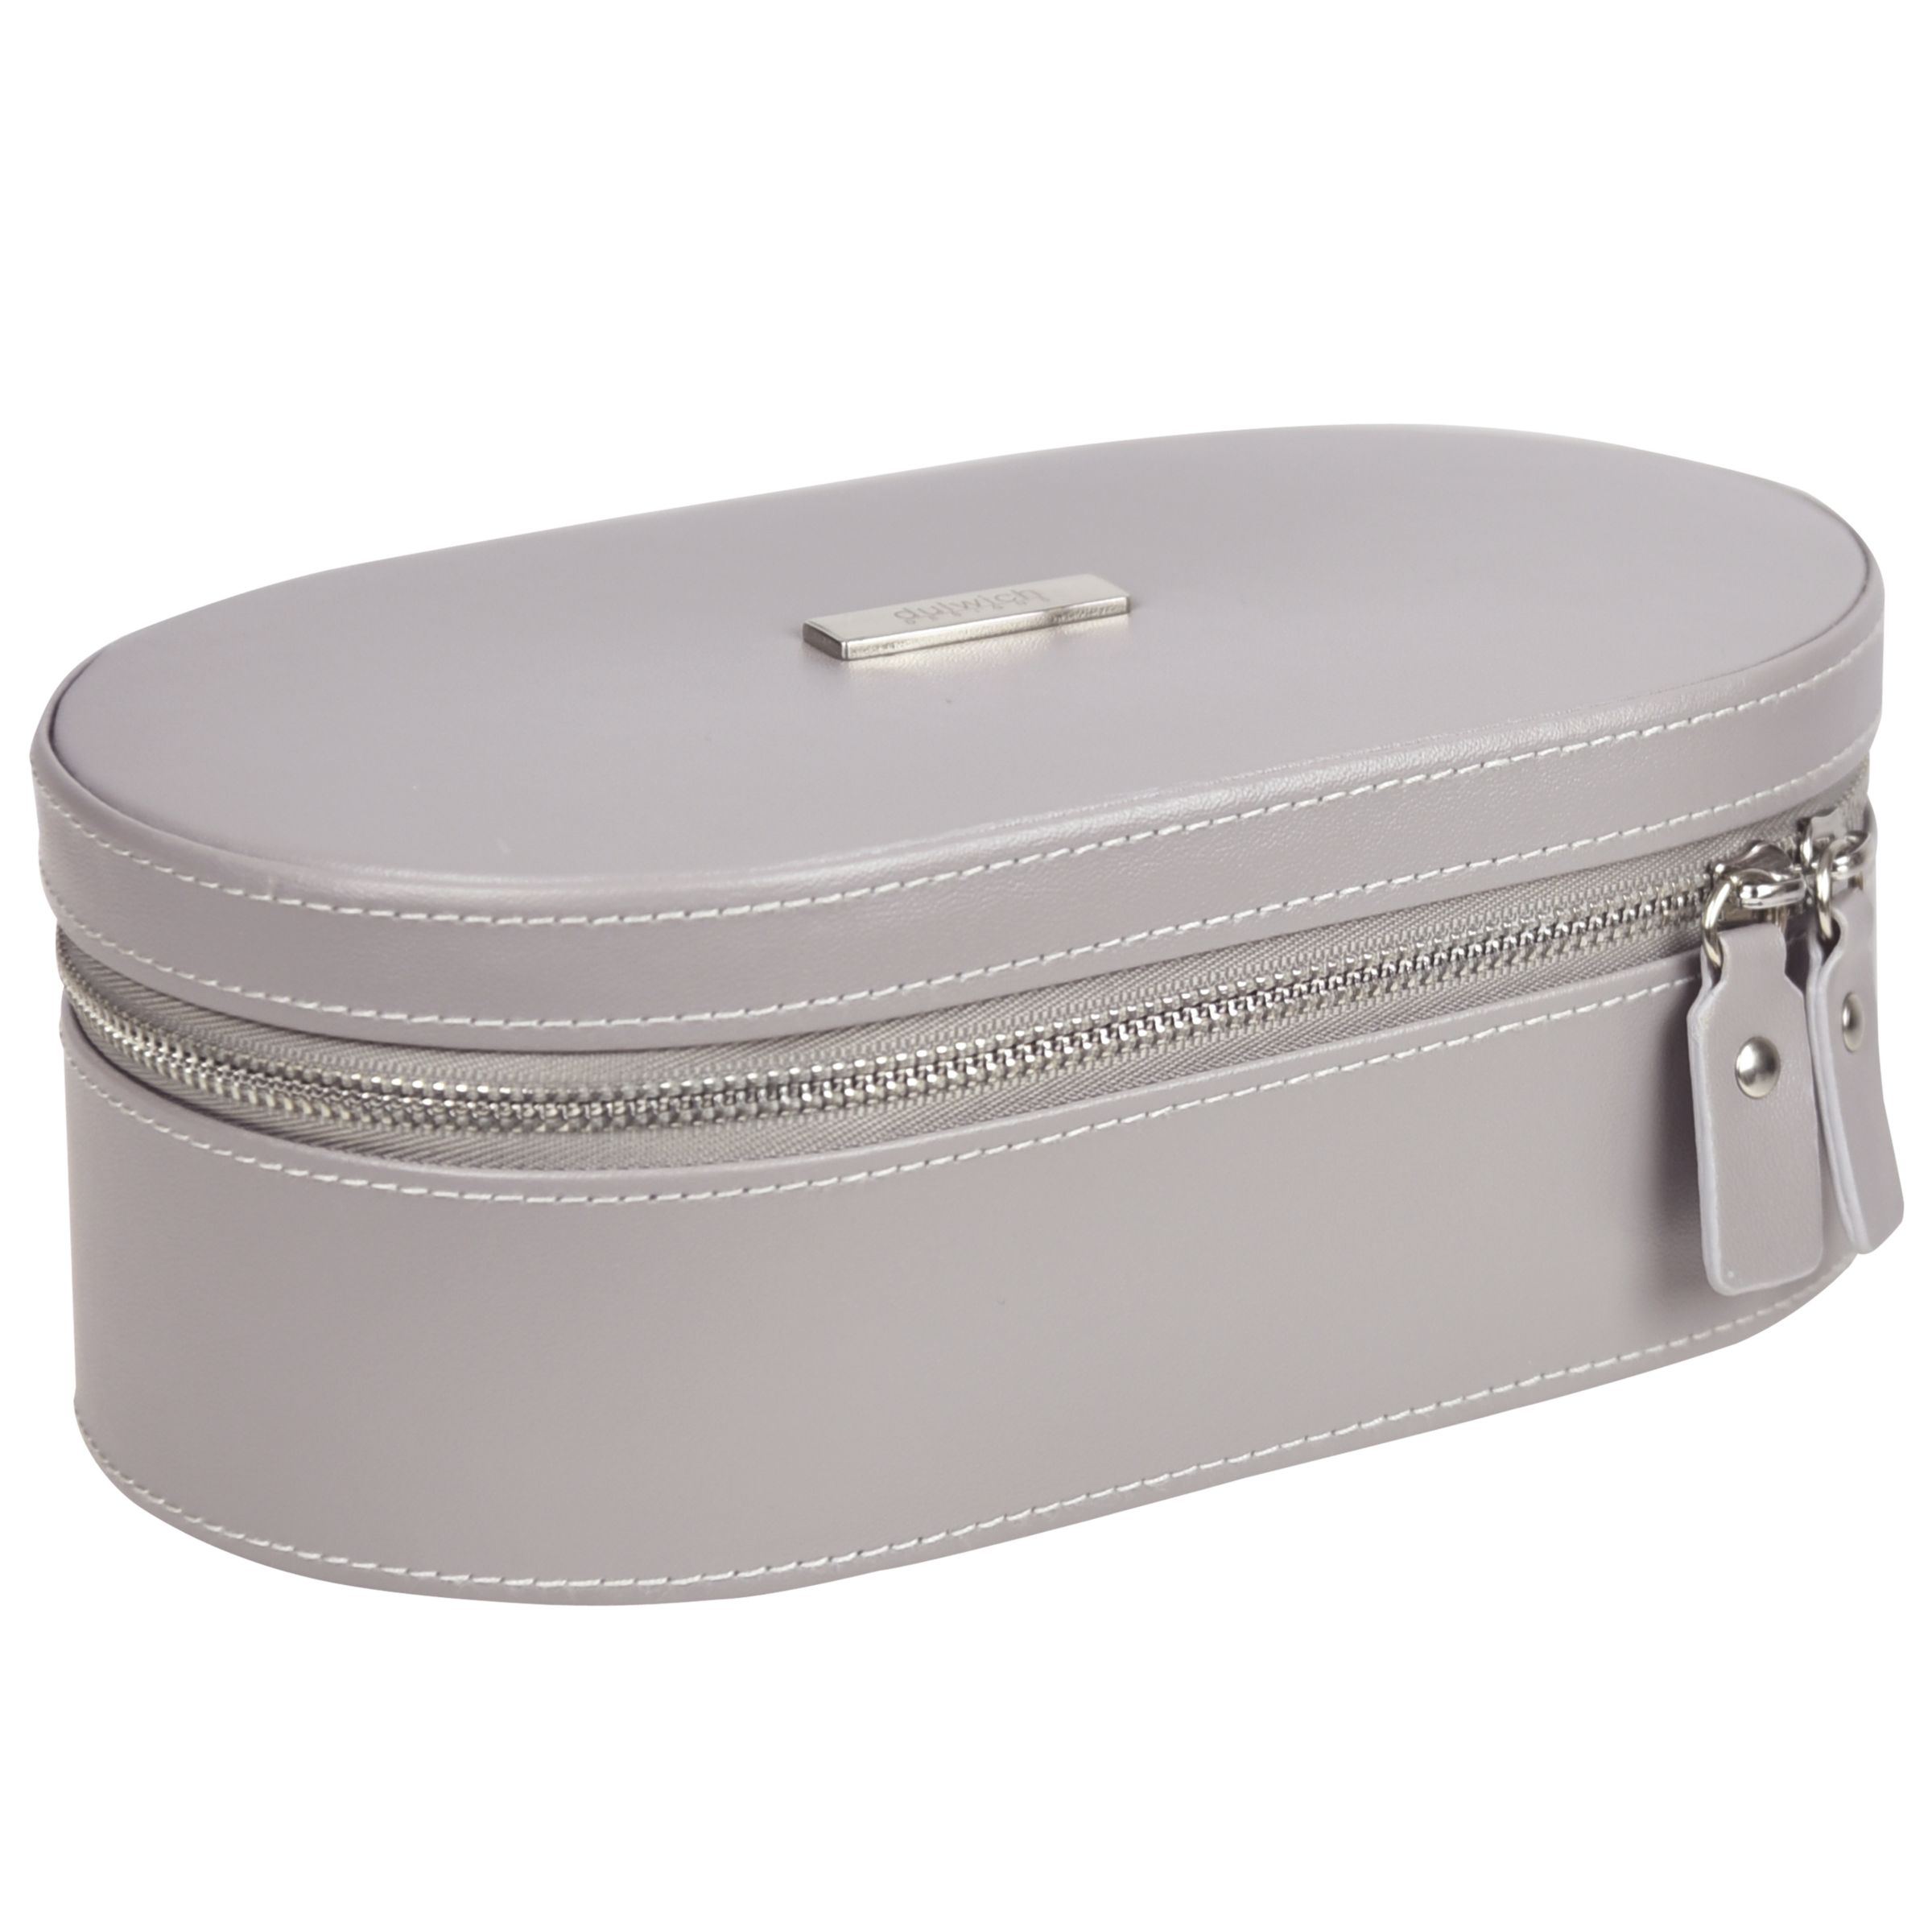 Dulwich Designs Dulwich Designs Large Travel box, Grey